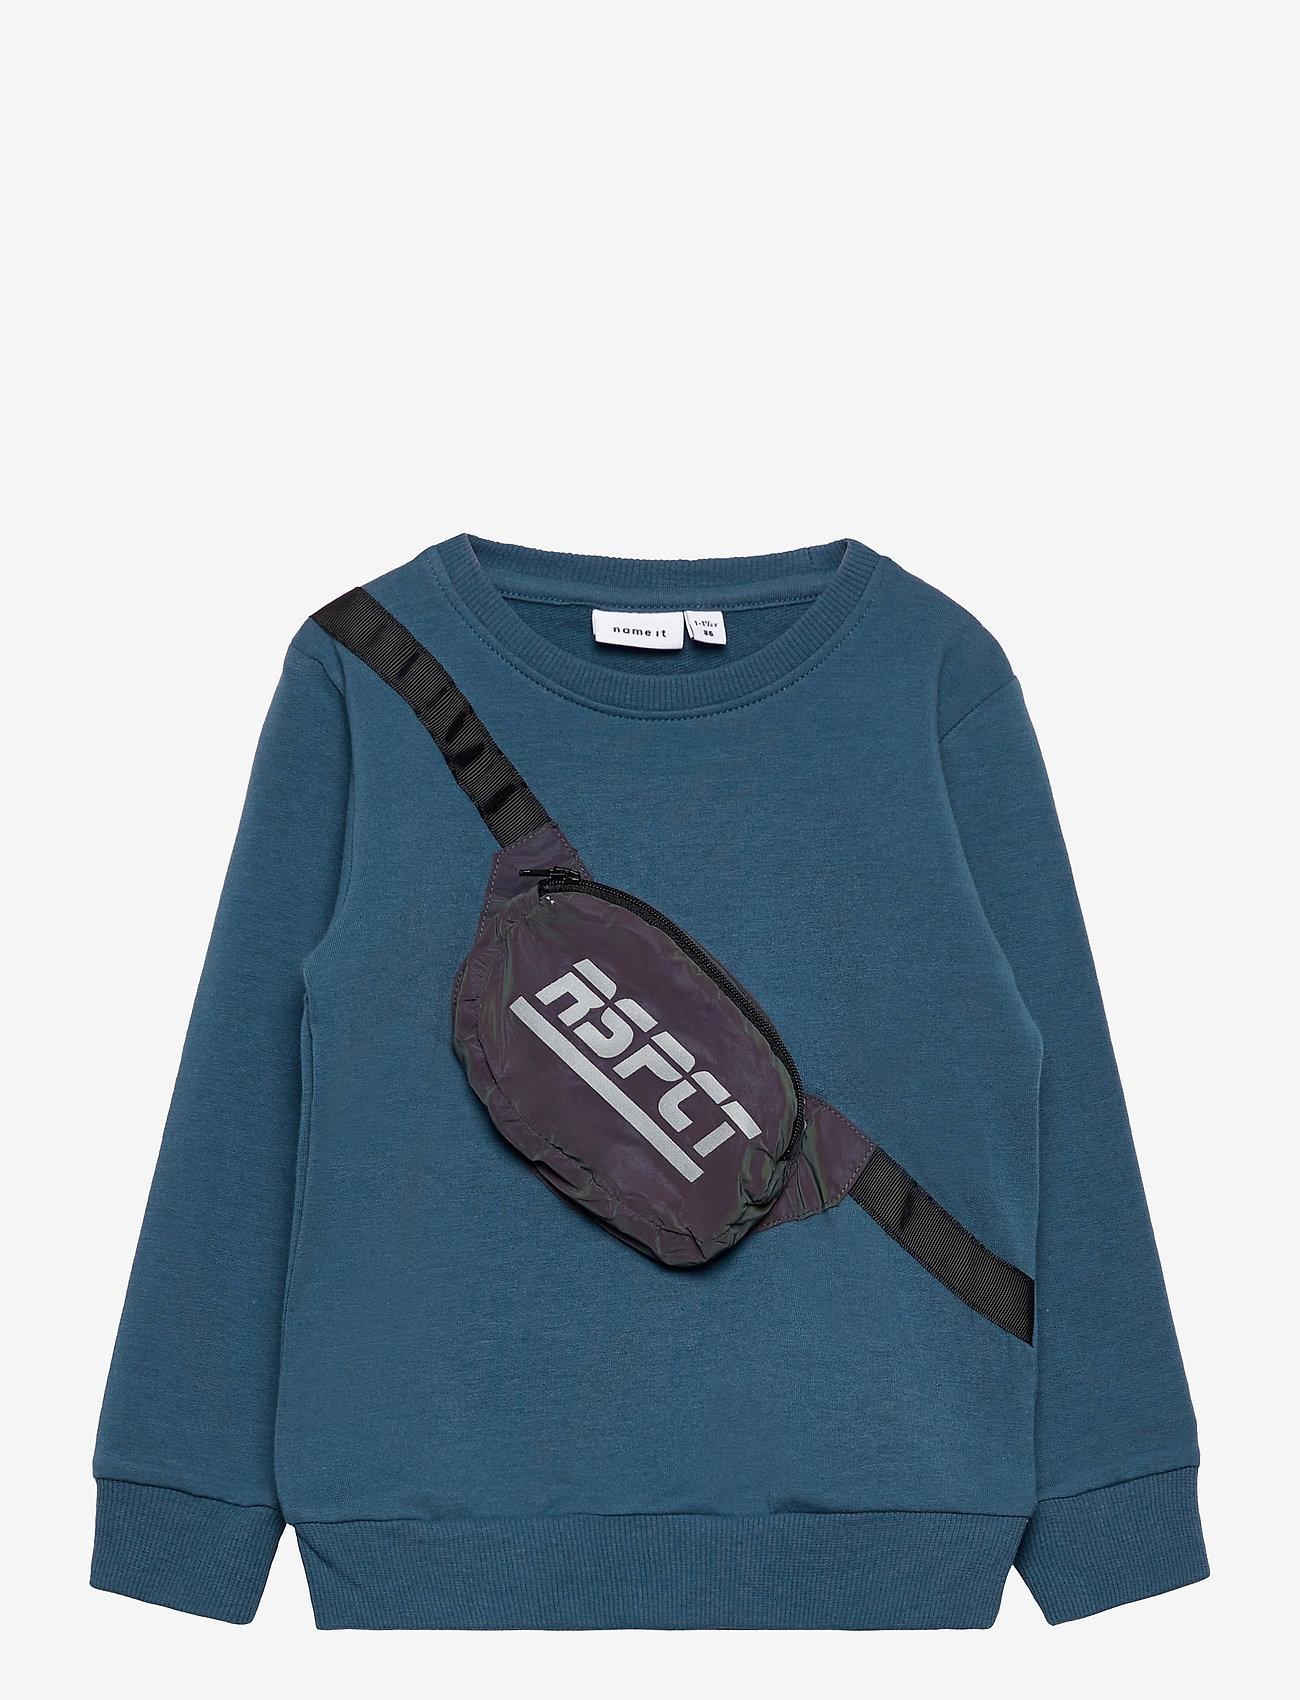 name it - NMMTOMA LS SWEAT BRU - sweatshirts - real teal - 0